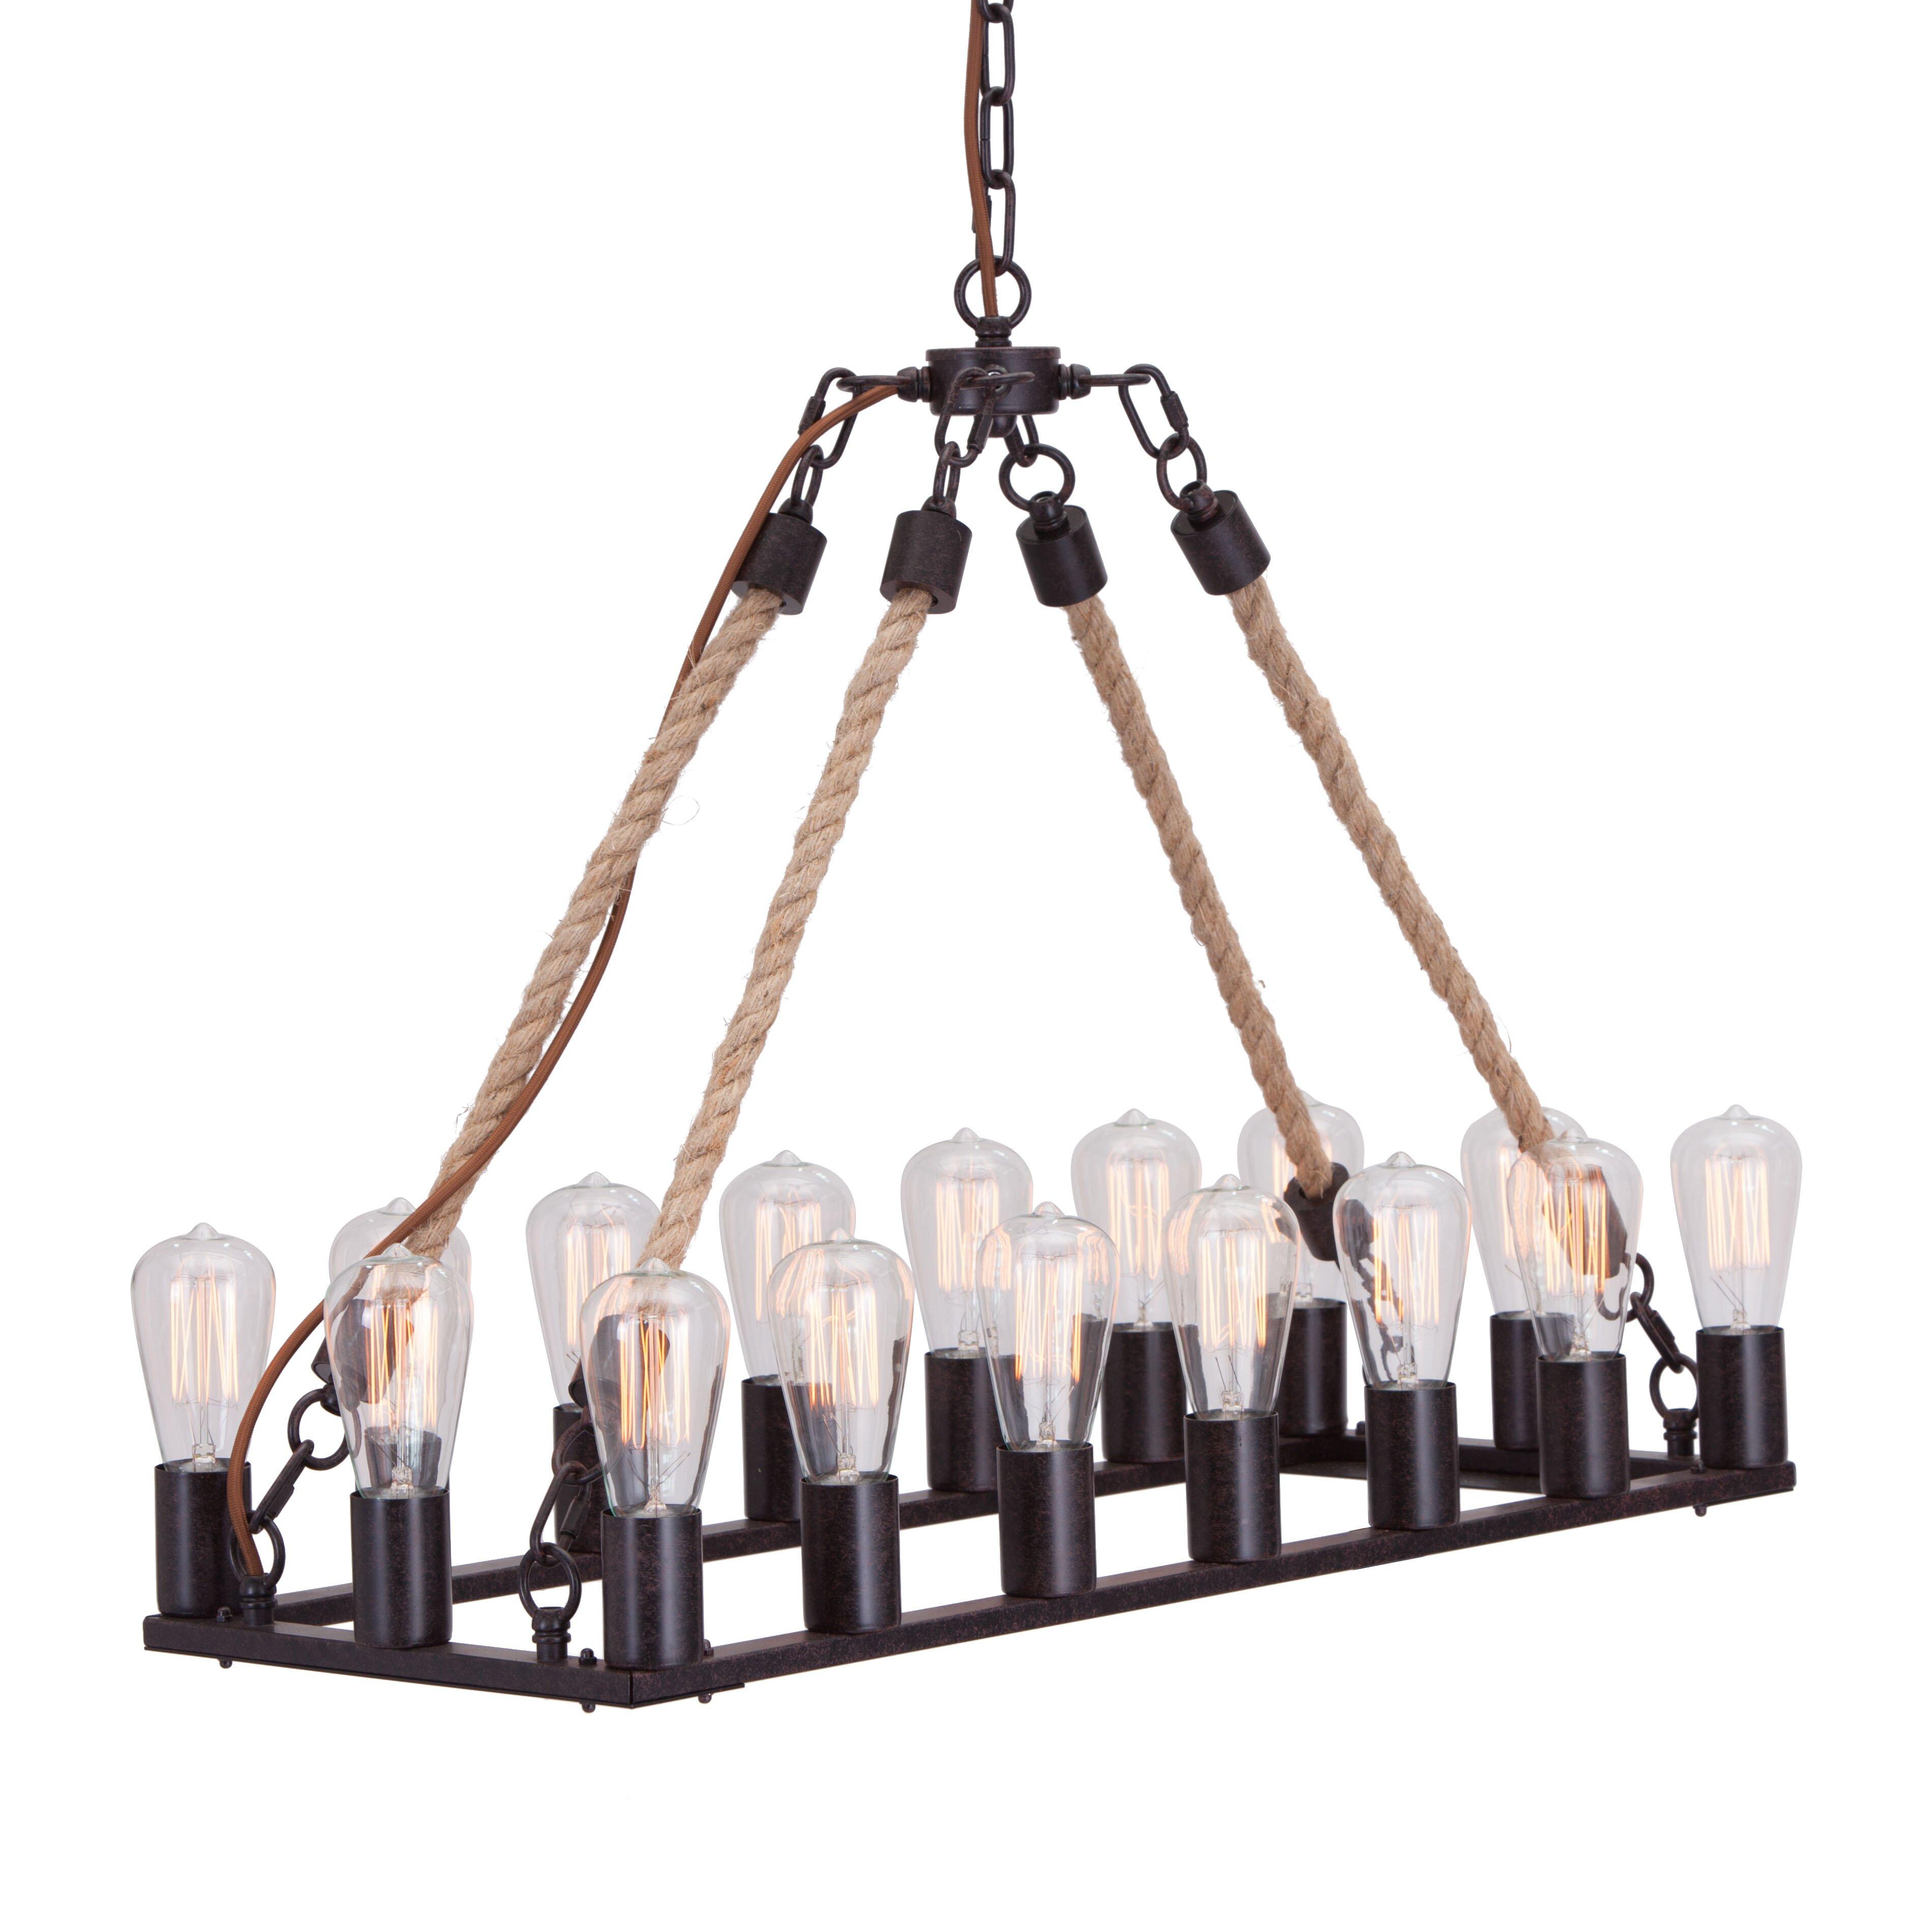 Zuo Ceiling Lamp: Zuo Era Gallite Ceiling Lamp & Reviews